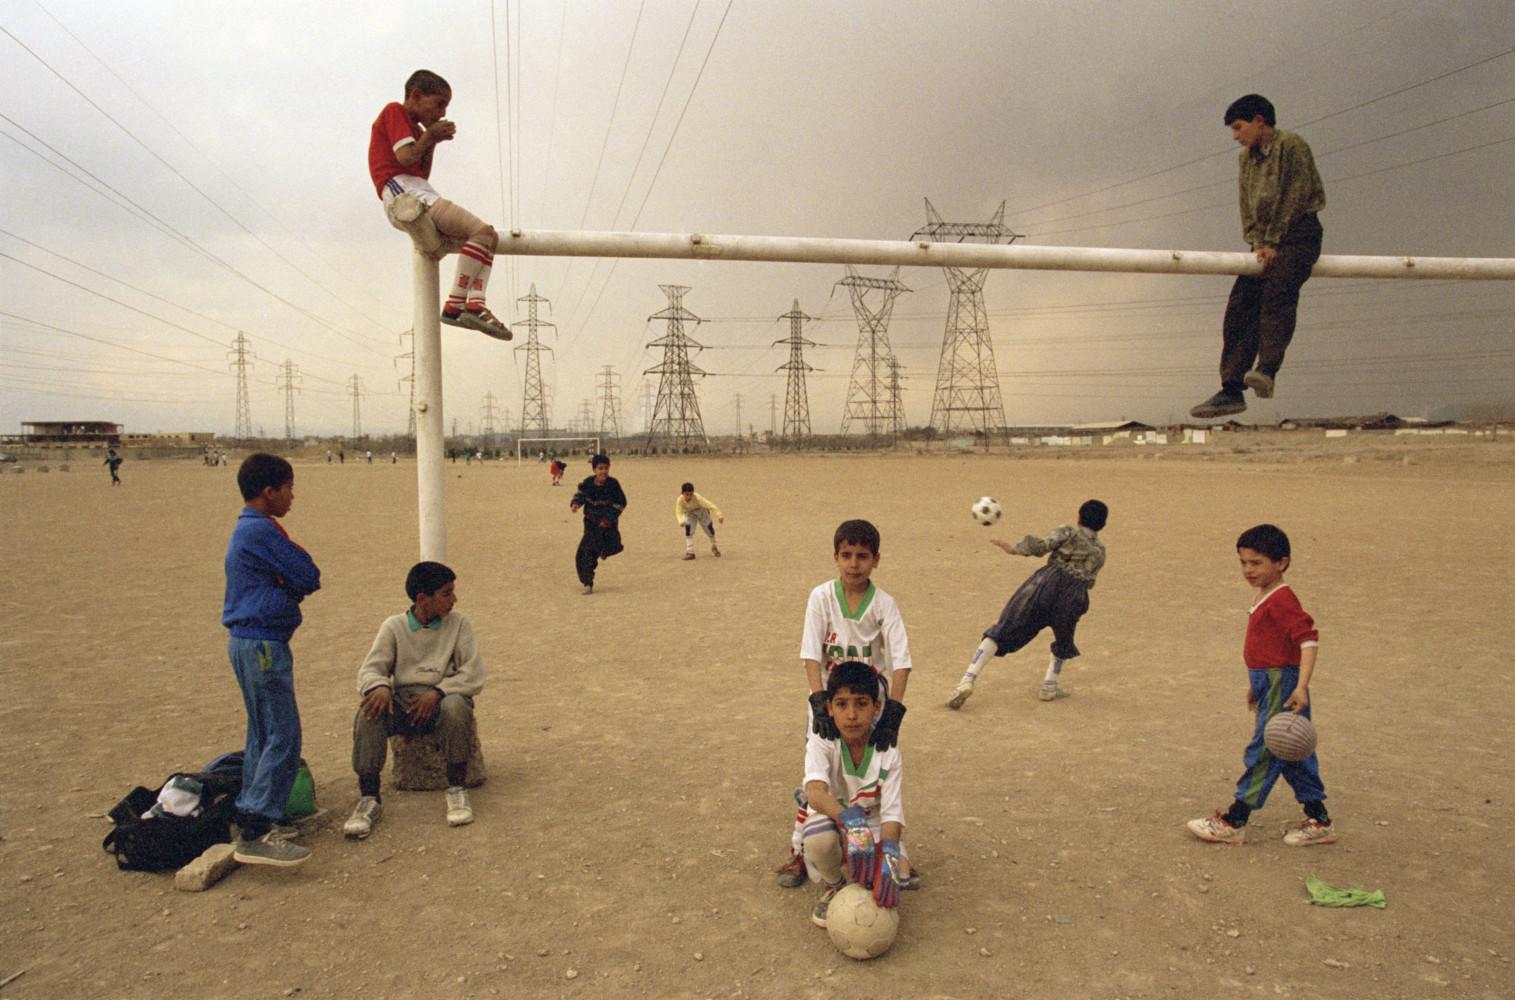 futbol oynayan cocuklar bublogta